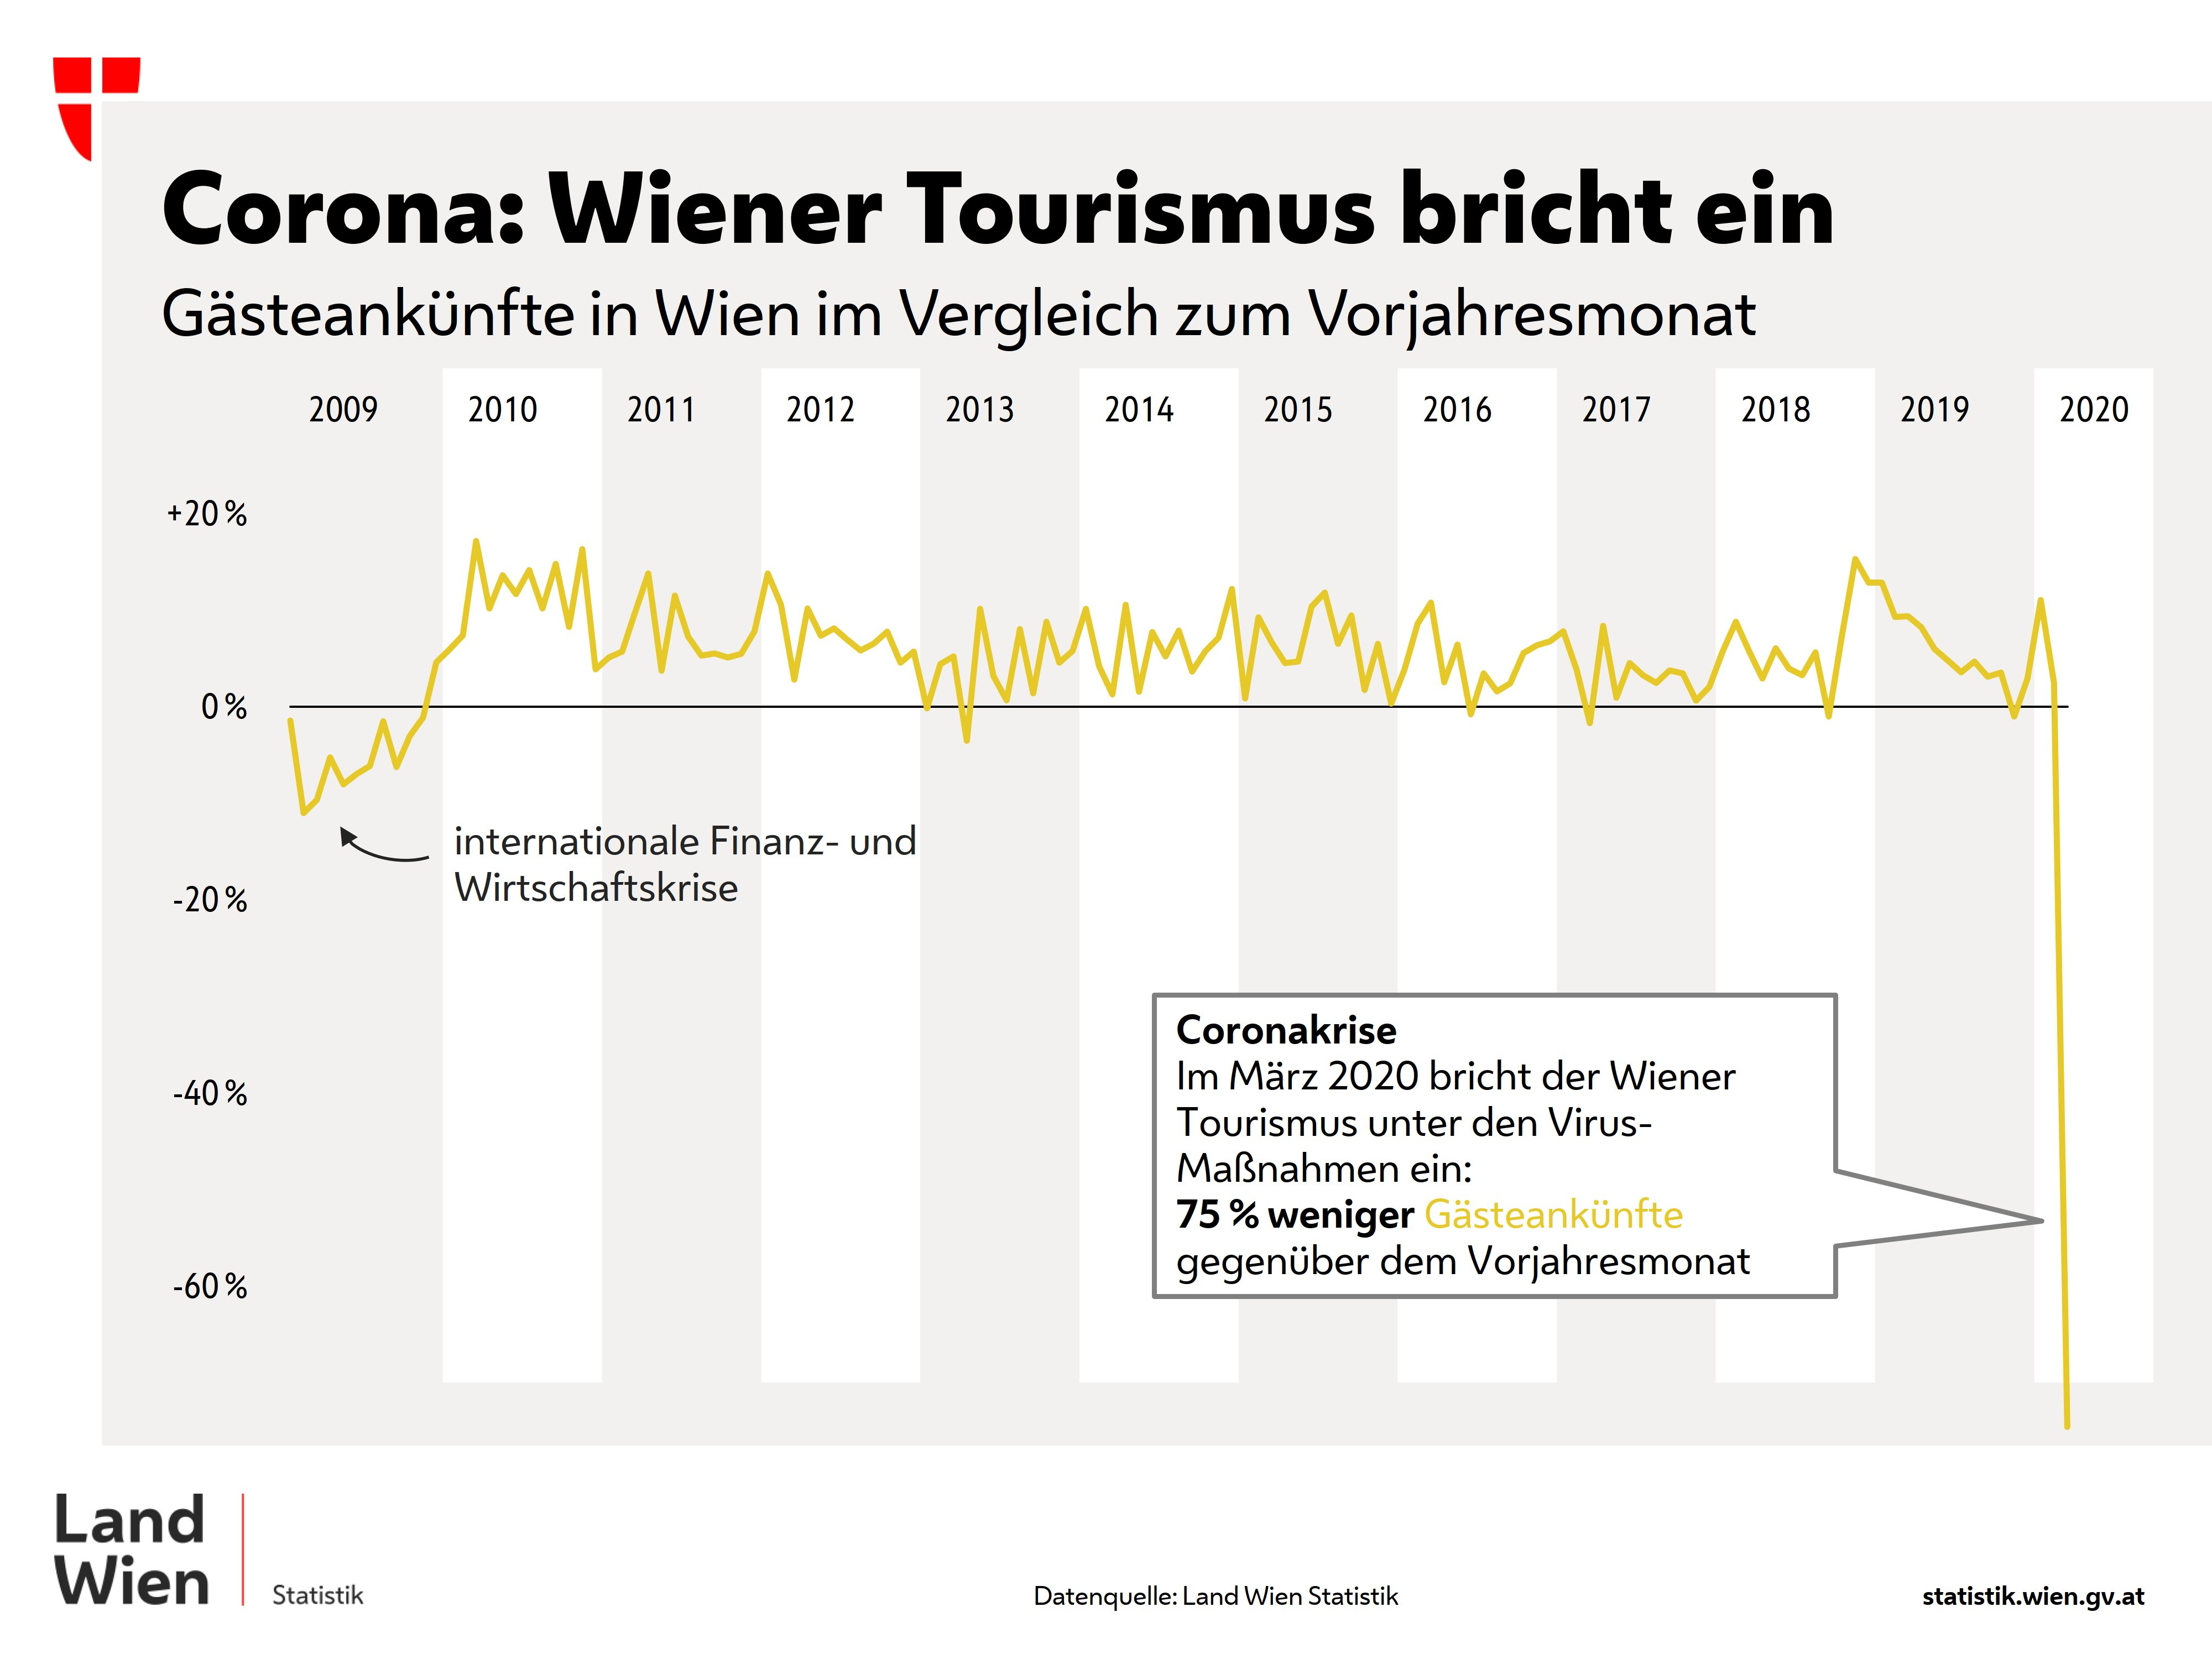 Corona Sammlungsprojekt Wien Museum